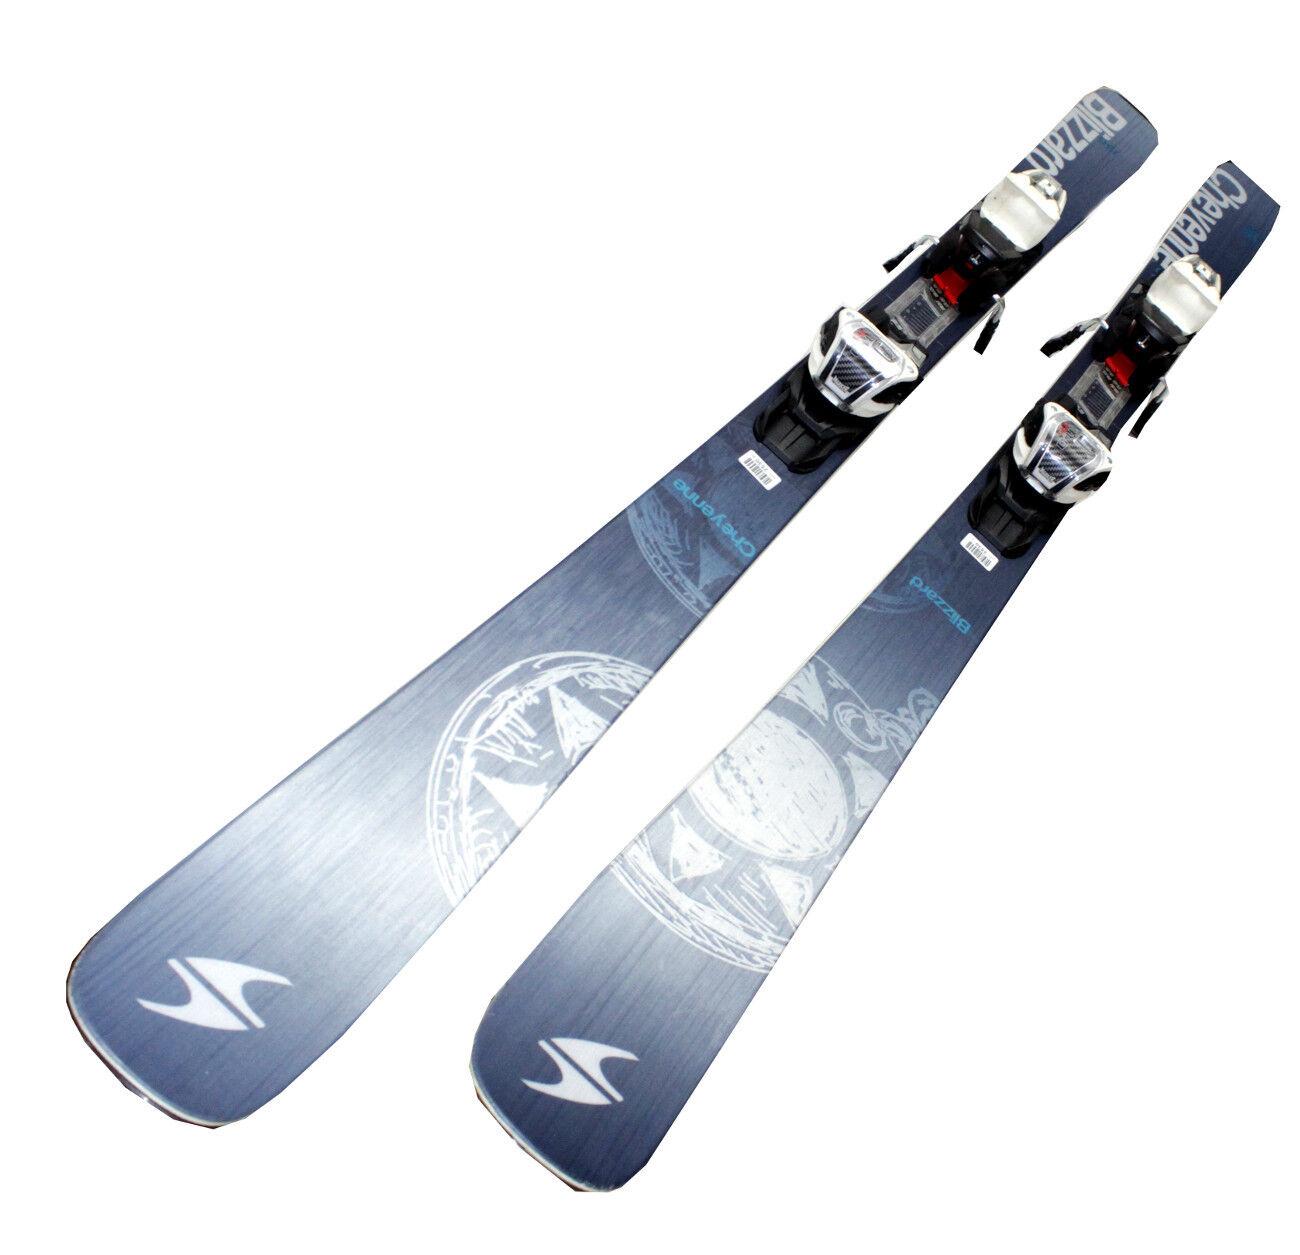 Blizzard Cheyenne Cheyenne Cheyenne Freeride Ski Set Allmountain Damen Testski Skibindung Marker 22d993